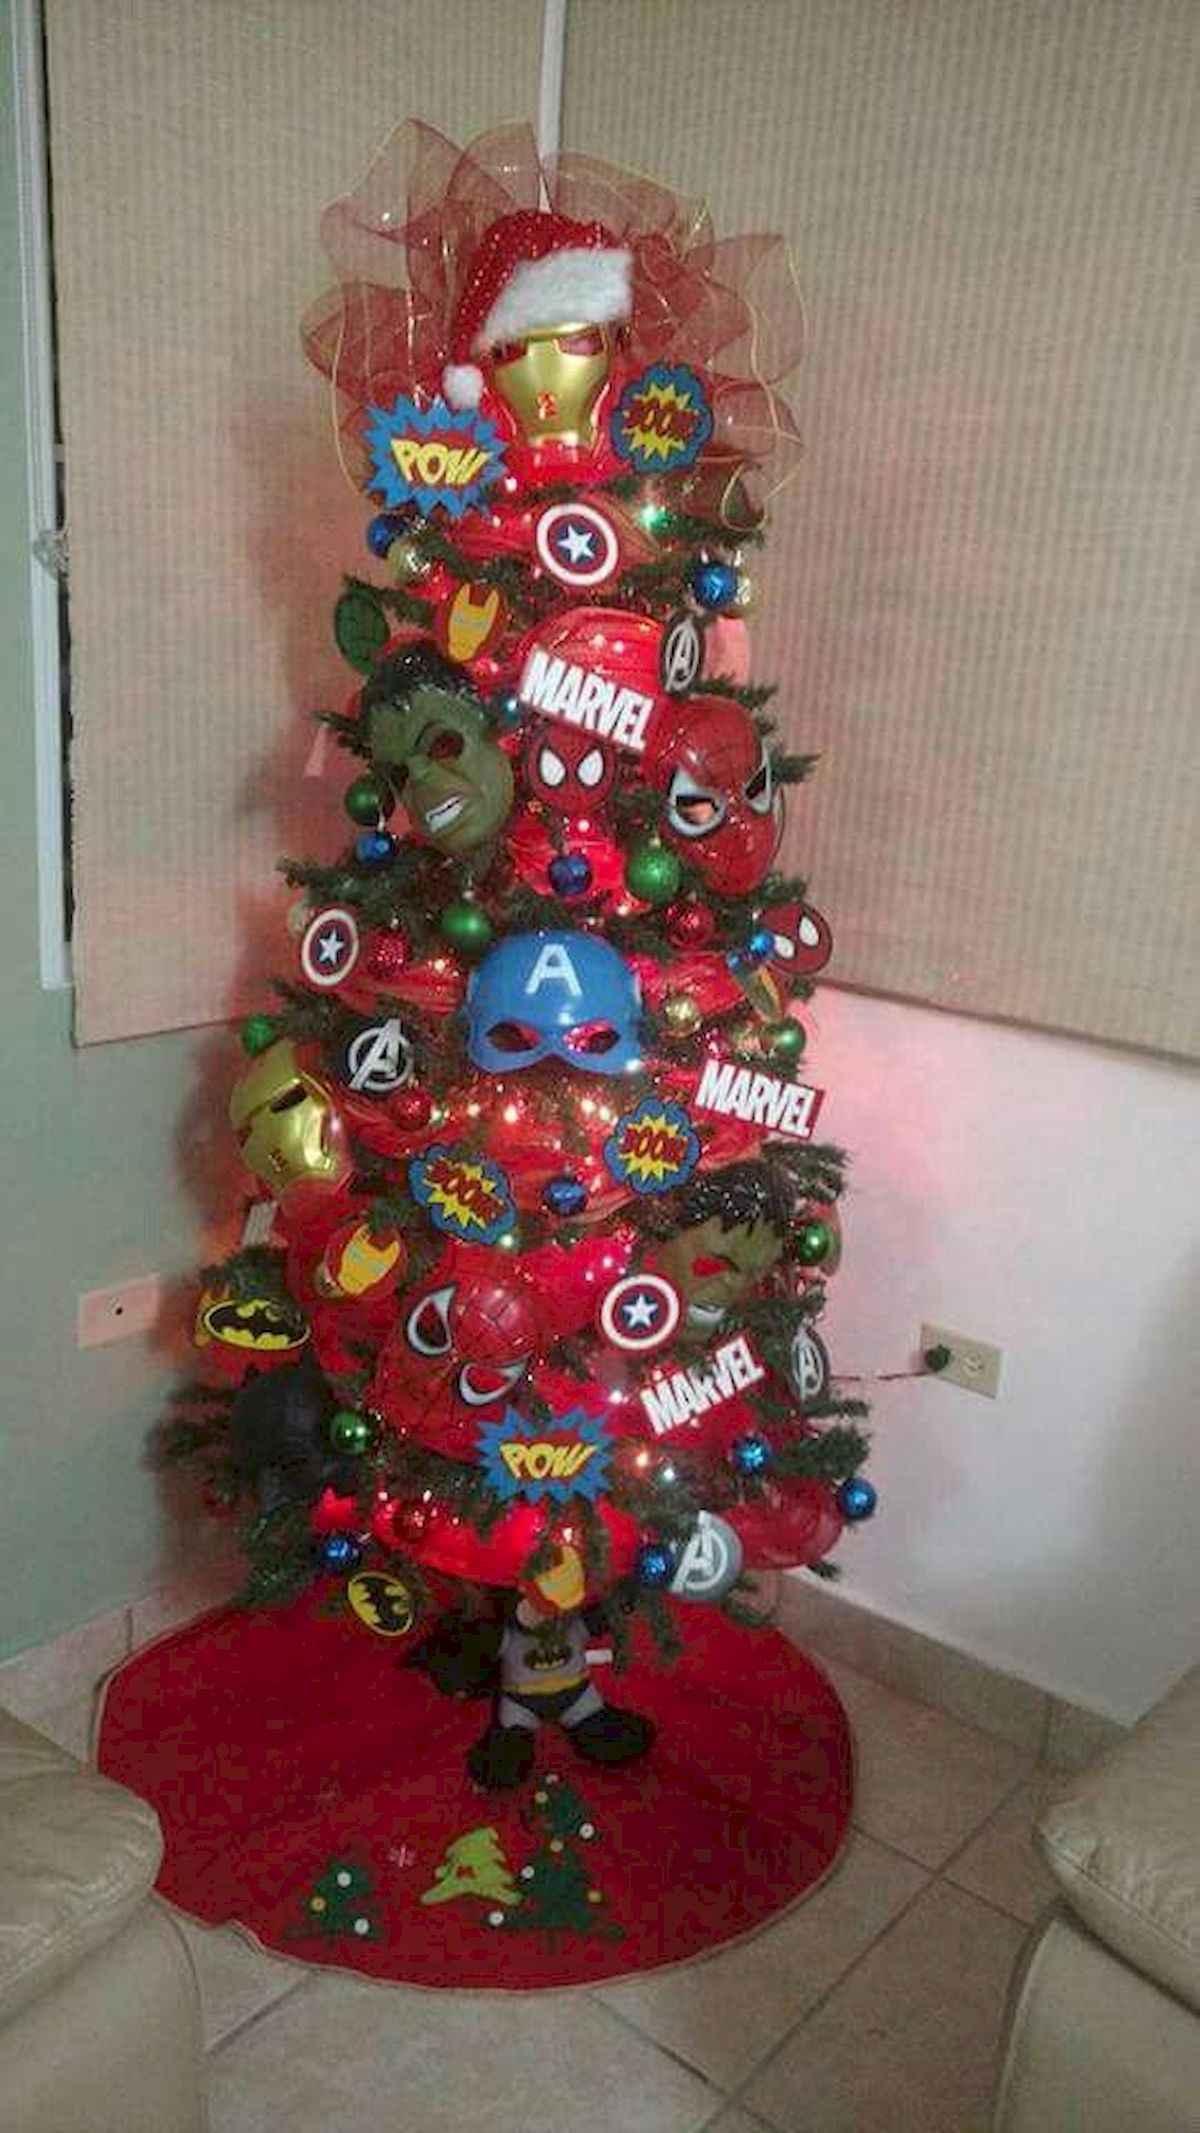 40 unique christmas tree ideas decorations (24)